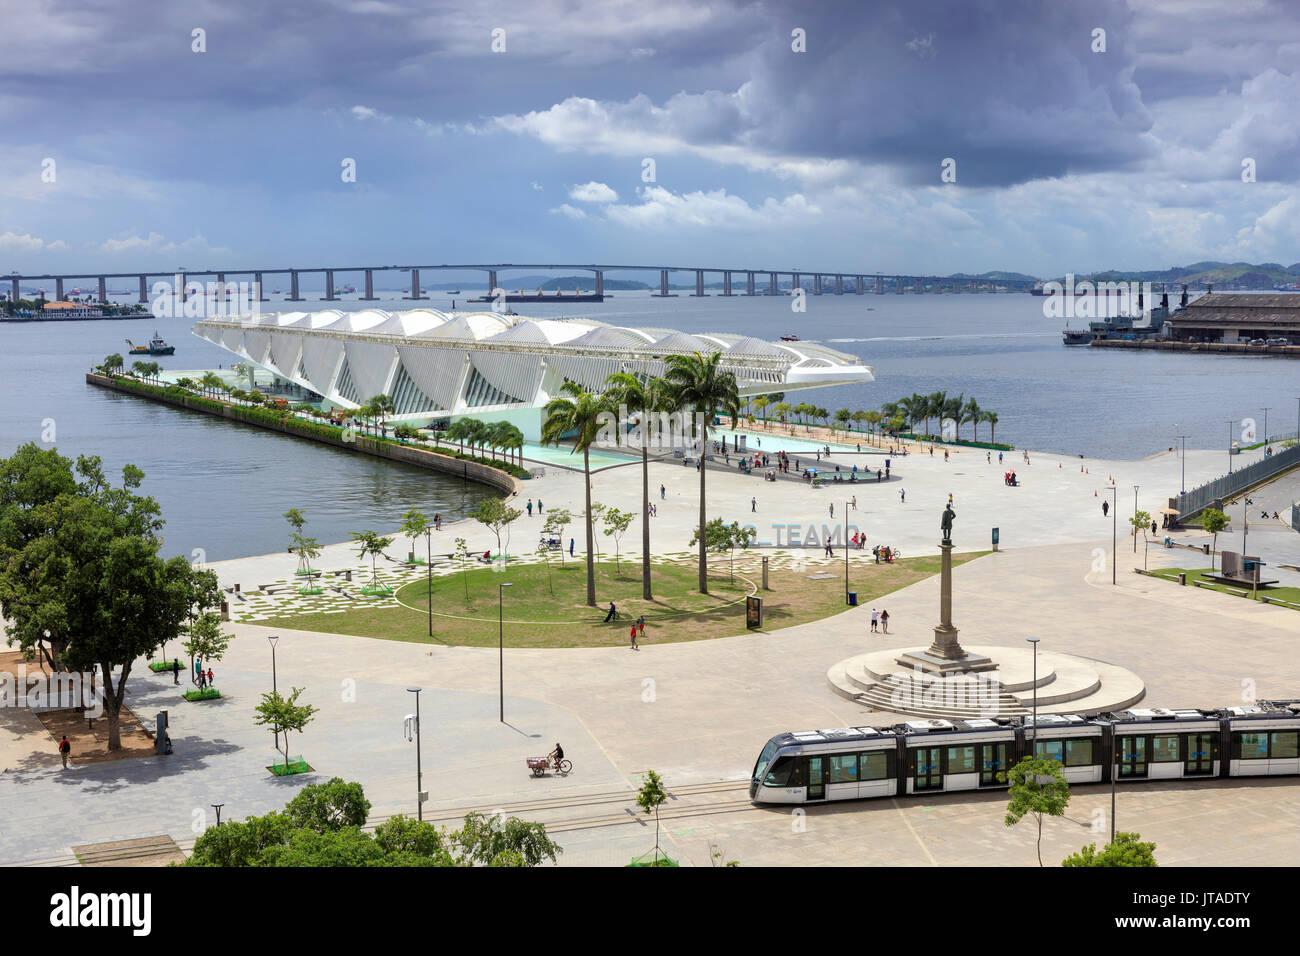 The Museum of Tomorrow, Porto Maravilha area and Niteroi Bridge, VLT tram in the foreground, city centre, Rio de Janeiro, Brazil - Stock Image